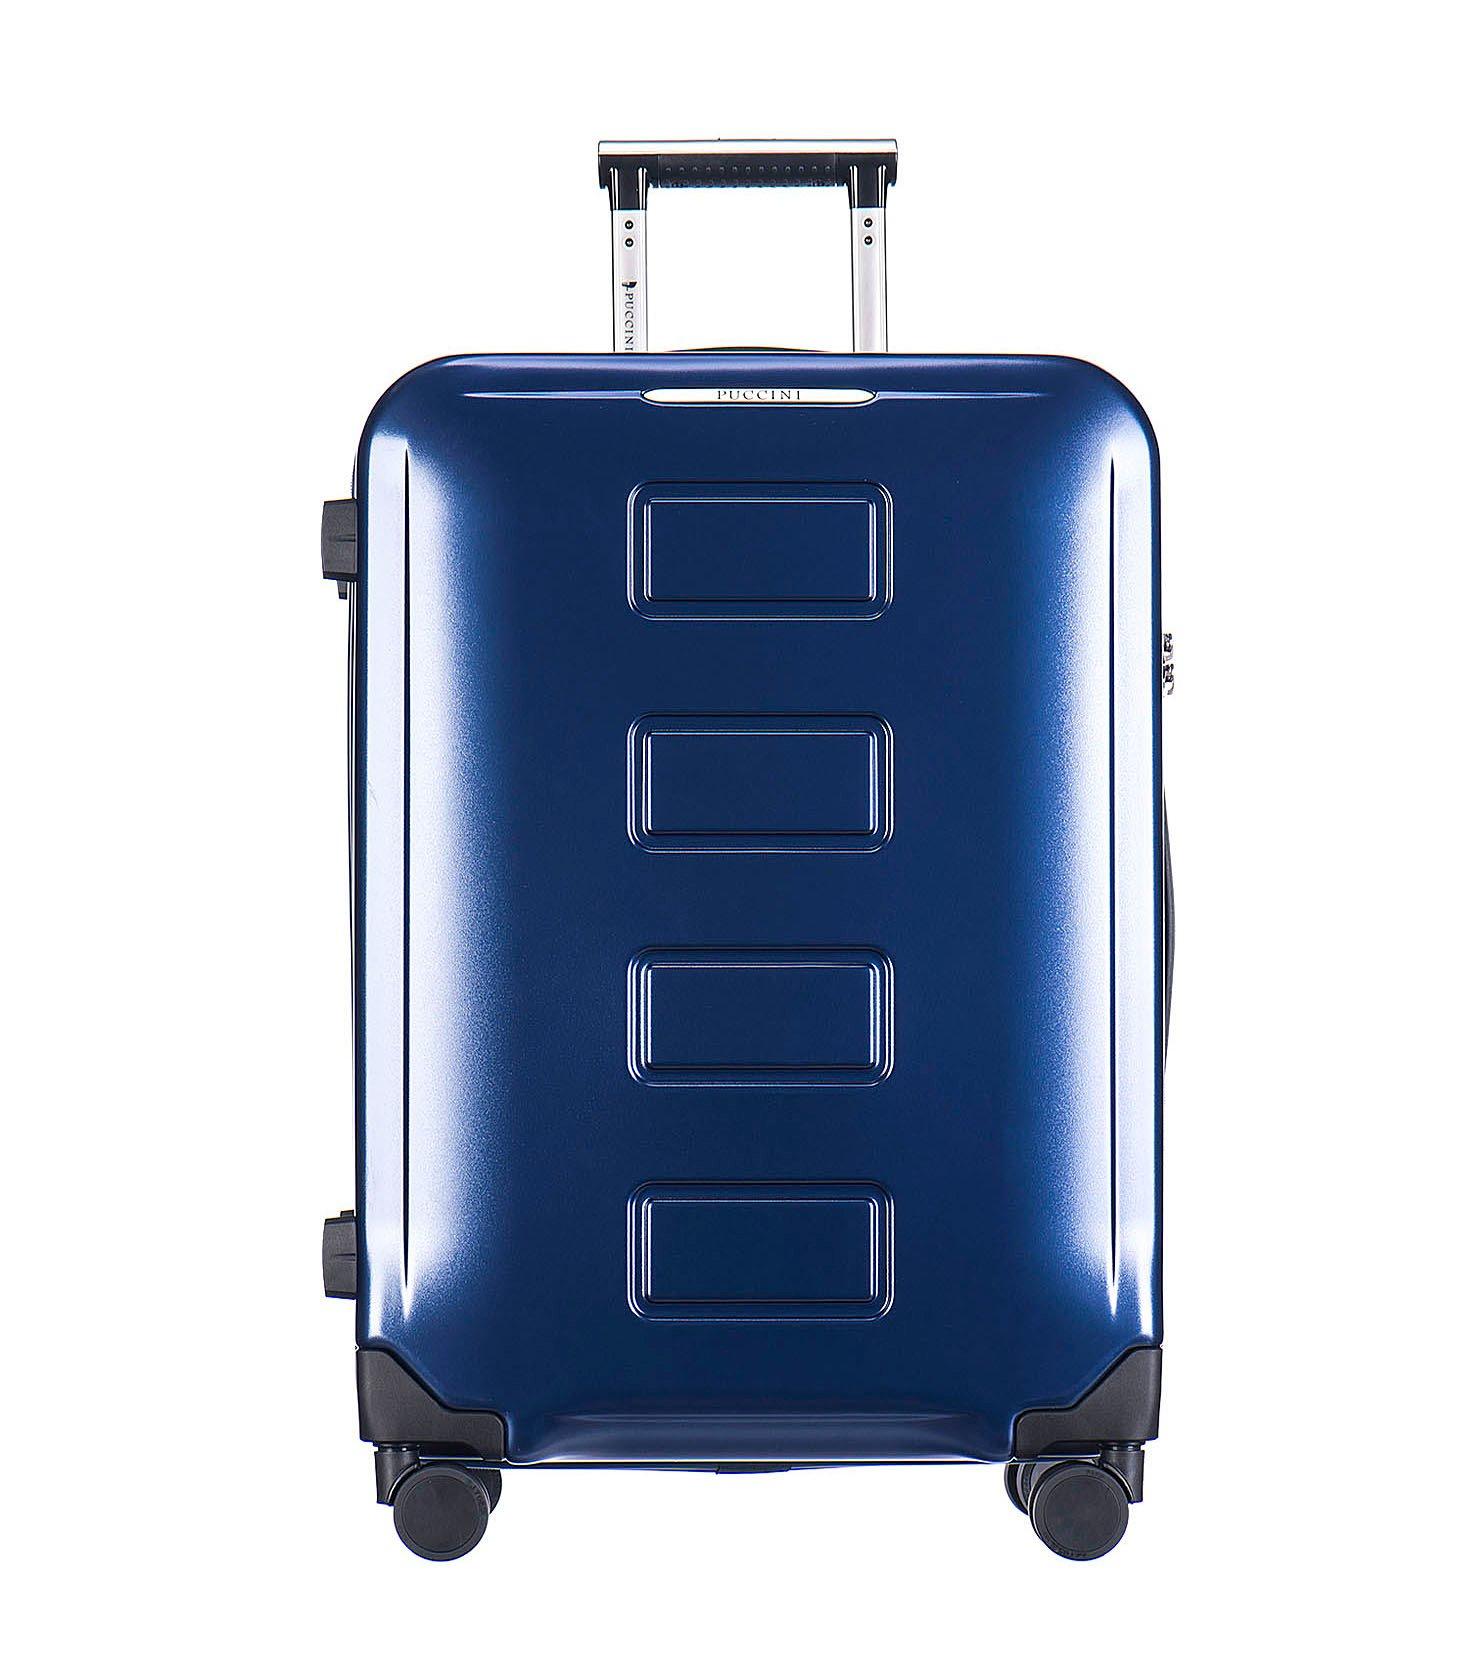 776f2ab21e0c0 Walizka Puccini Vancouver niebieska duża zamek TSA - 7659437436 ...